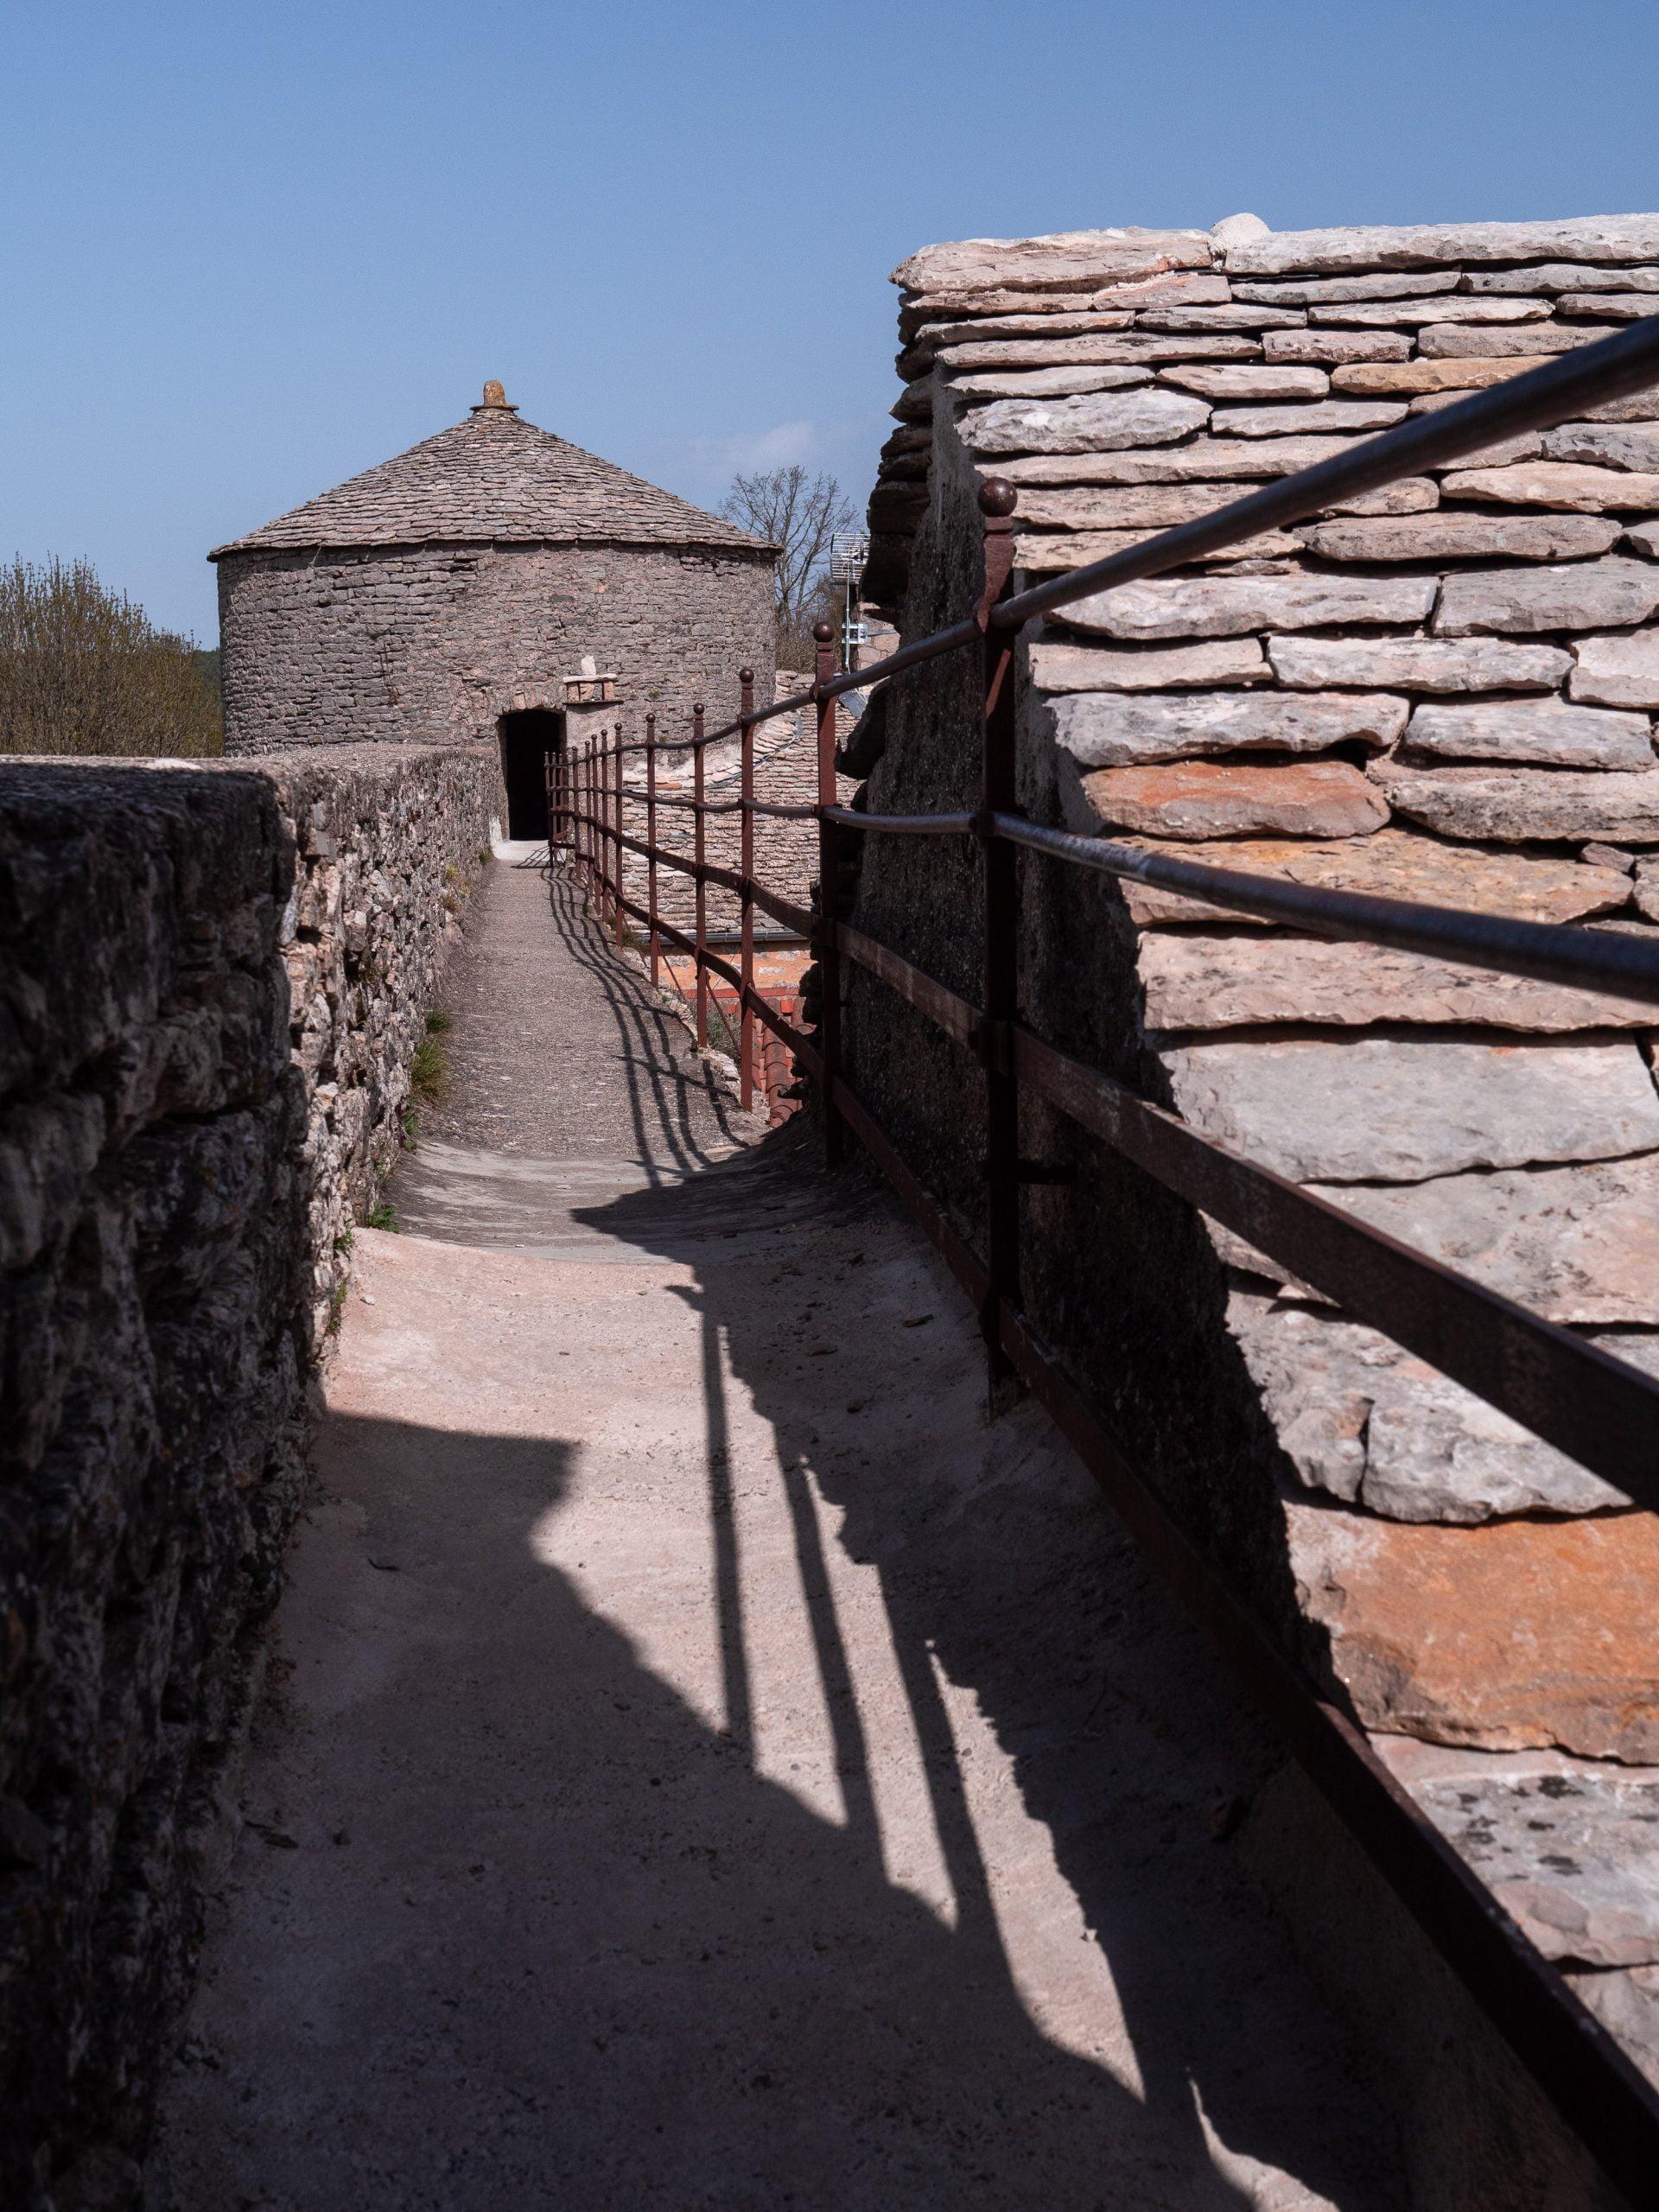 La couvertoirade Aveyron France